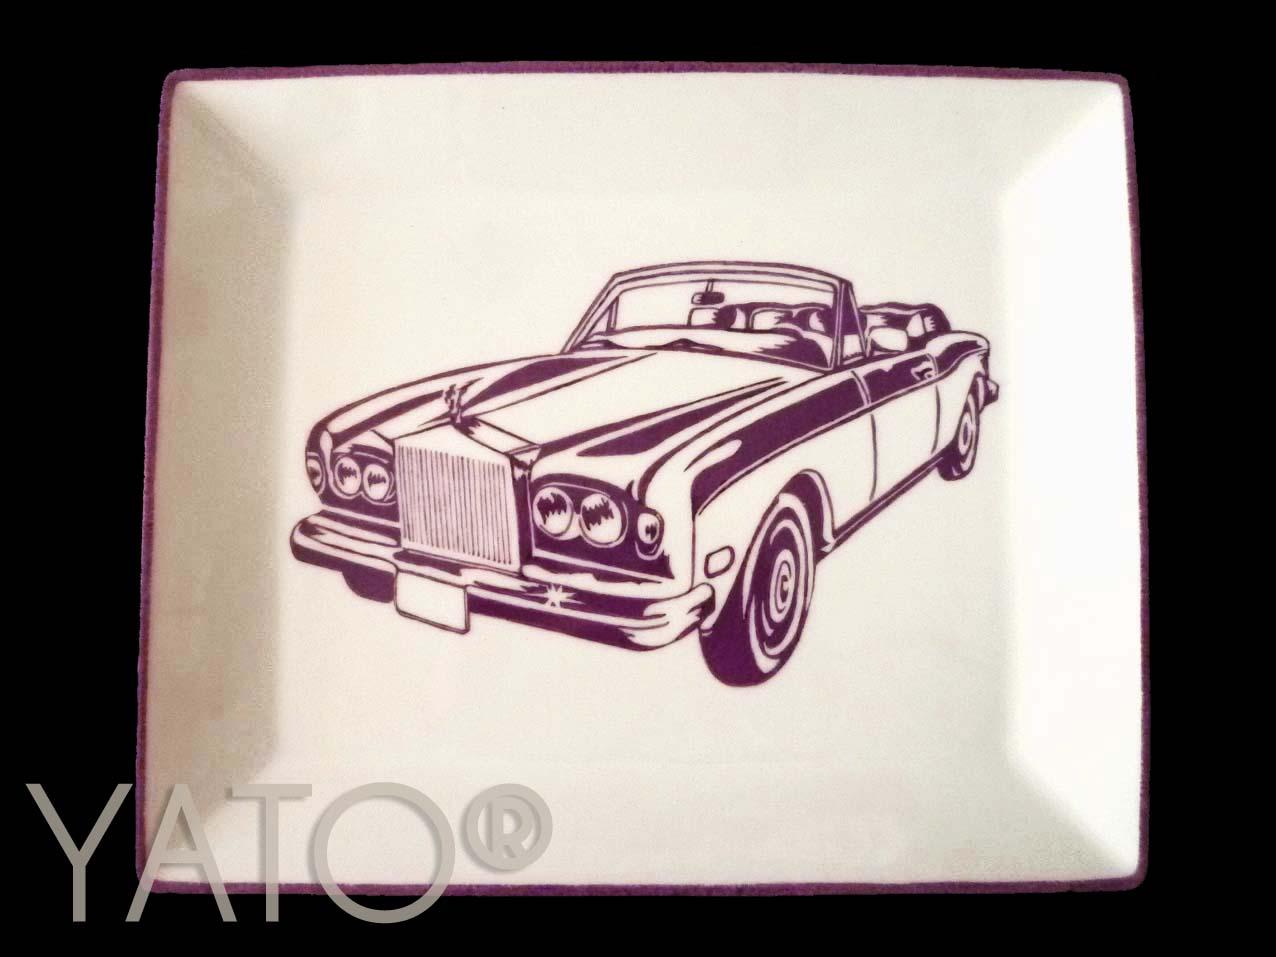 White – Cars rolls